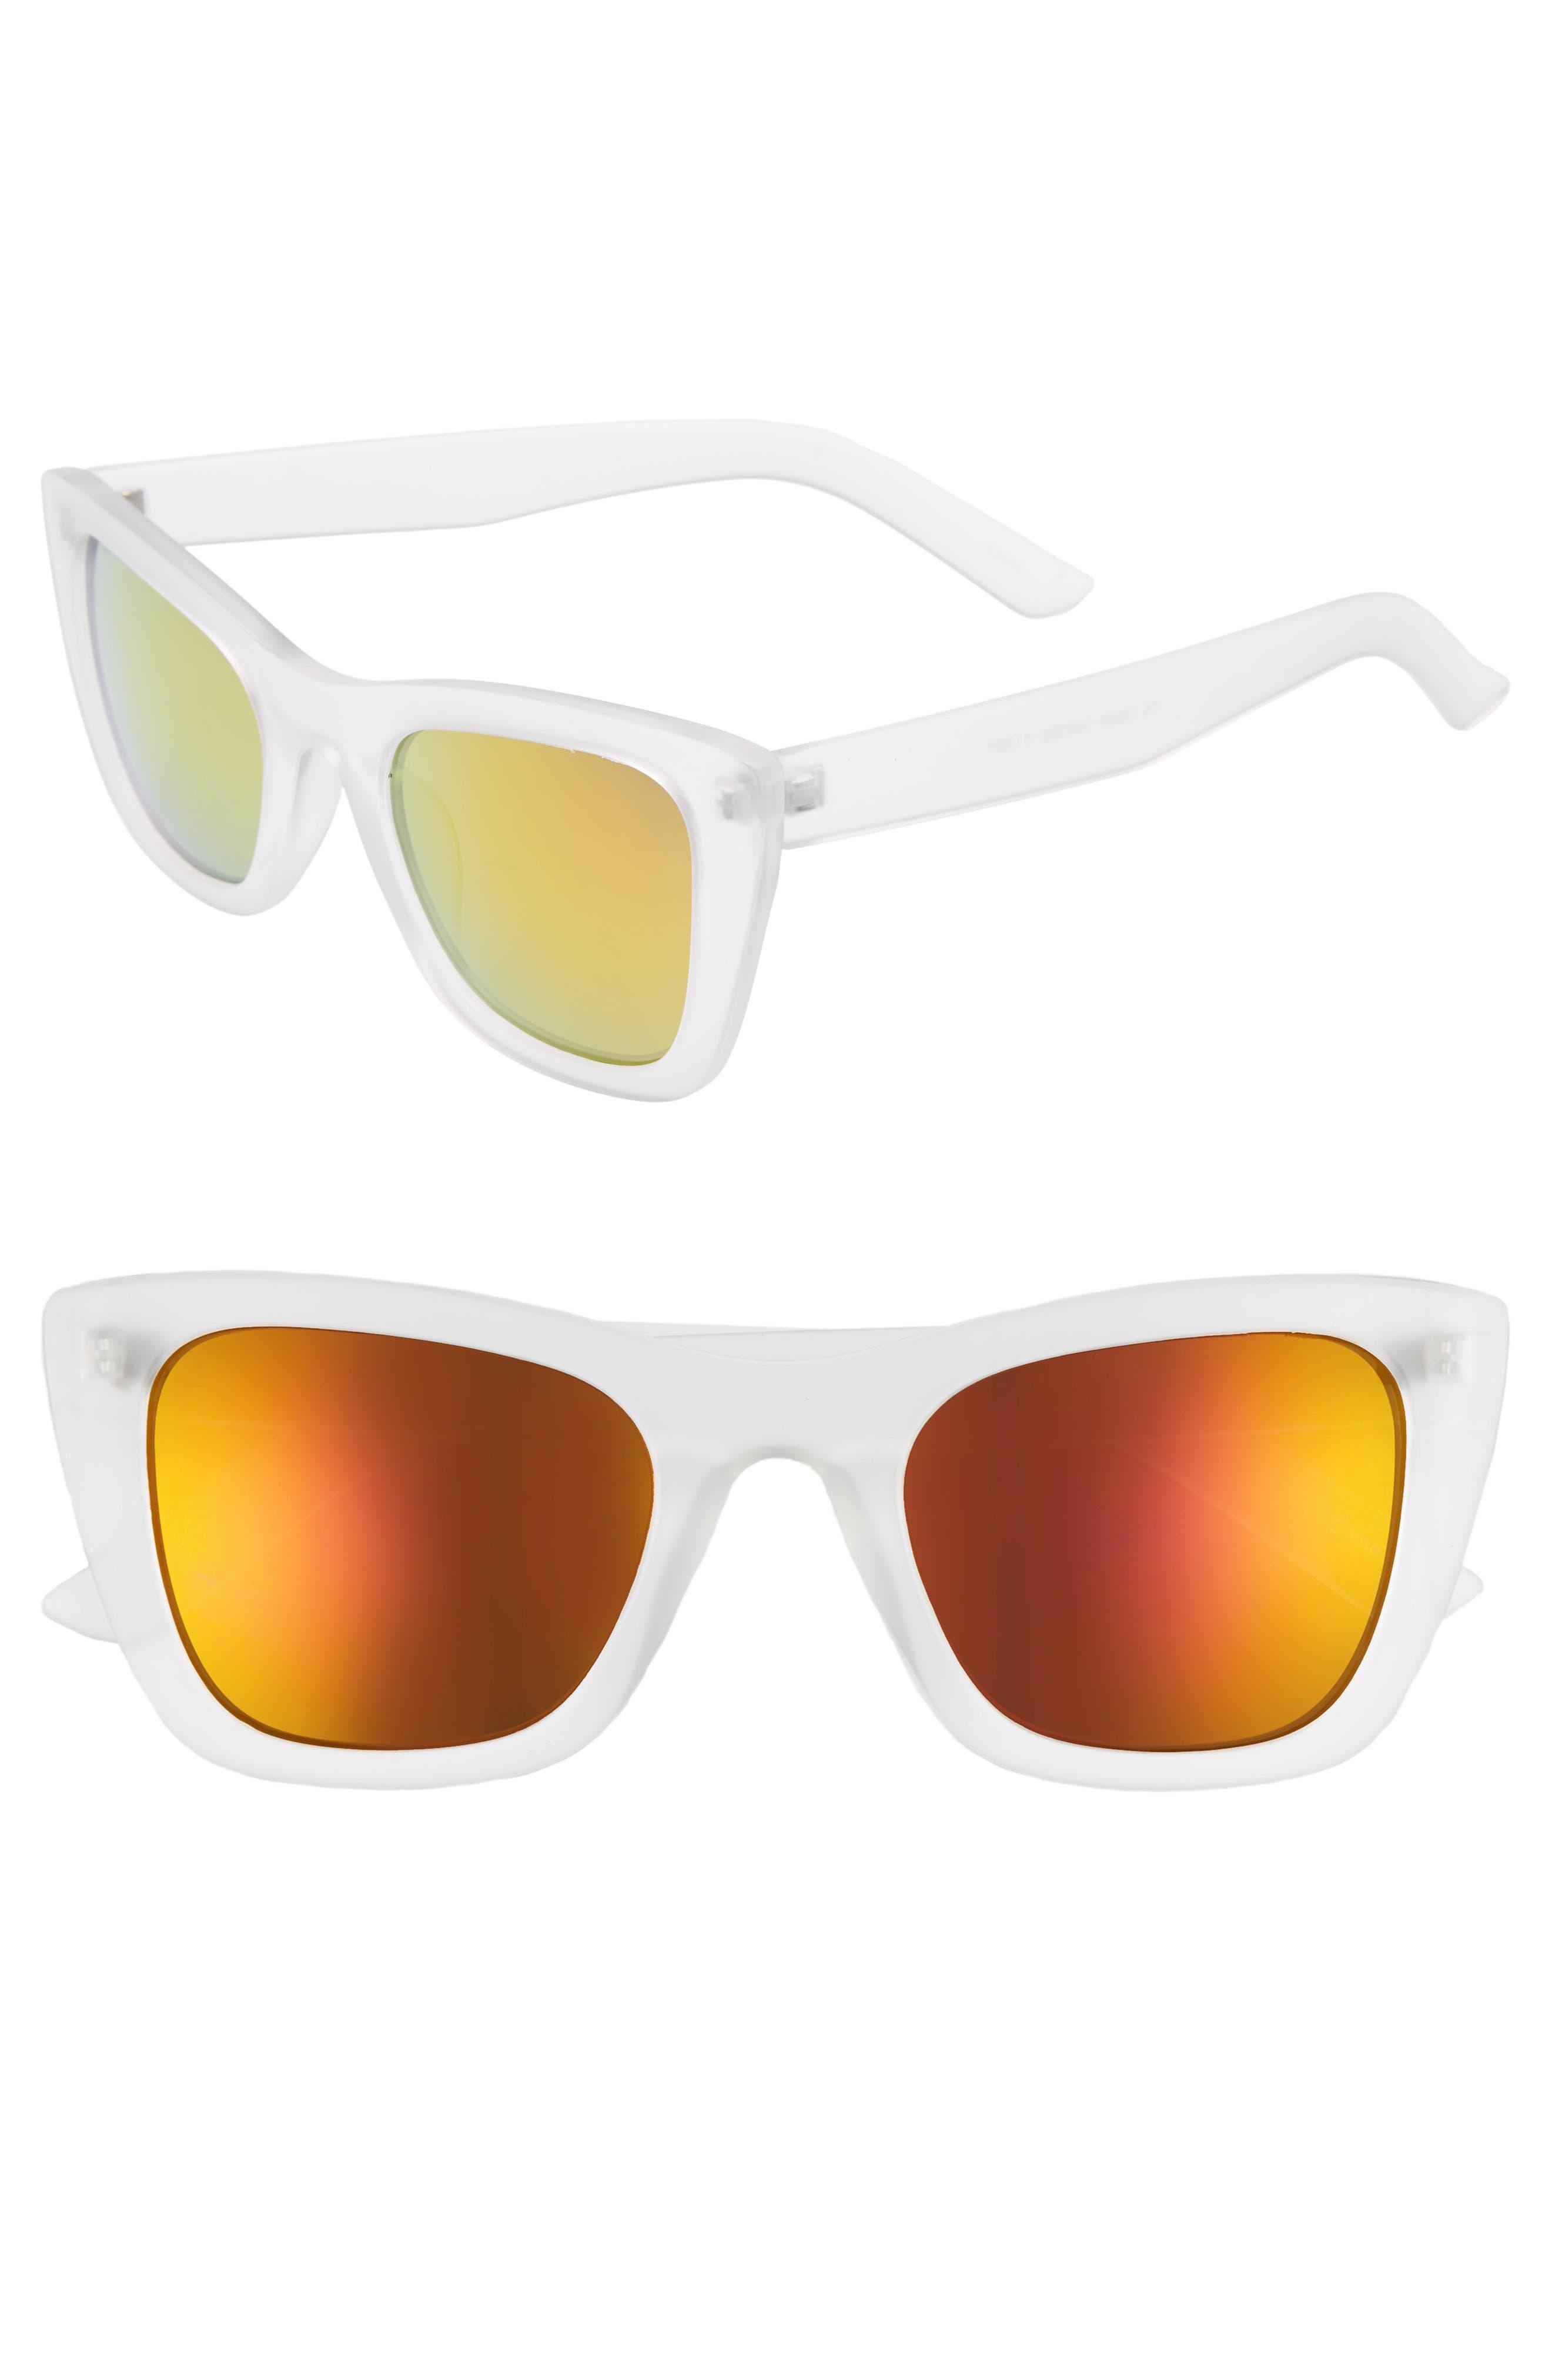 51mm Translucent Square Sunglasses,                         Main,                         color, 100